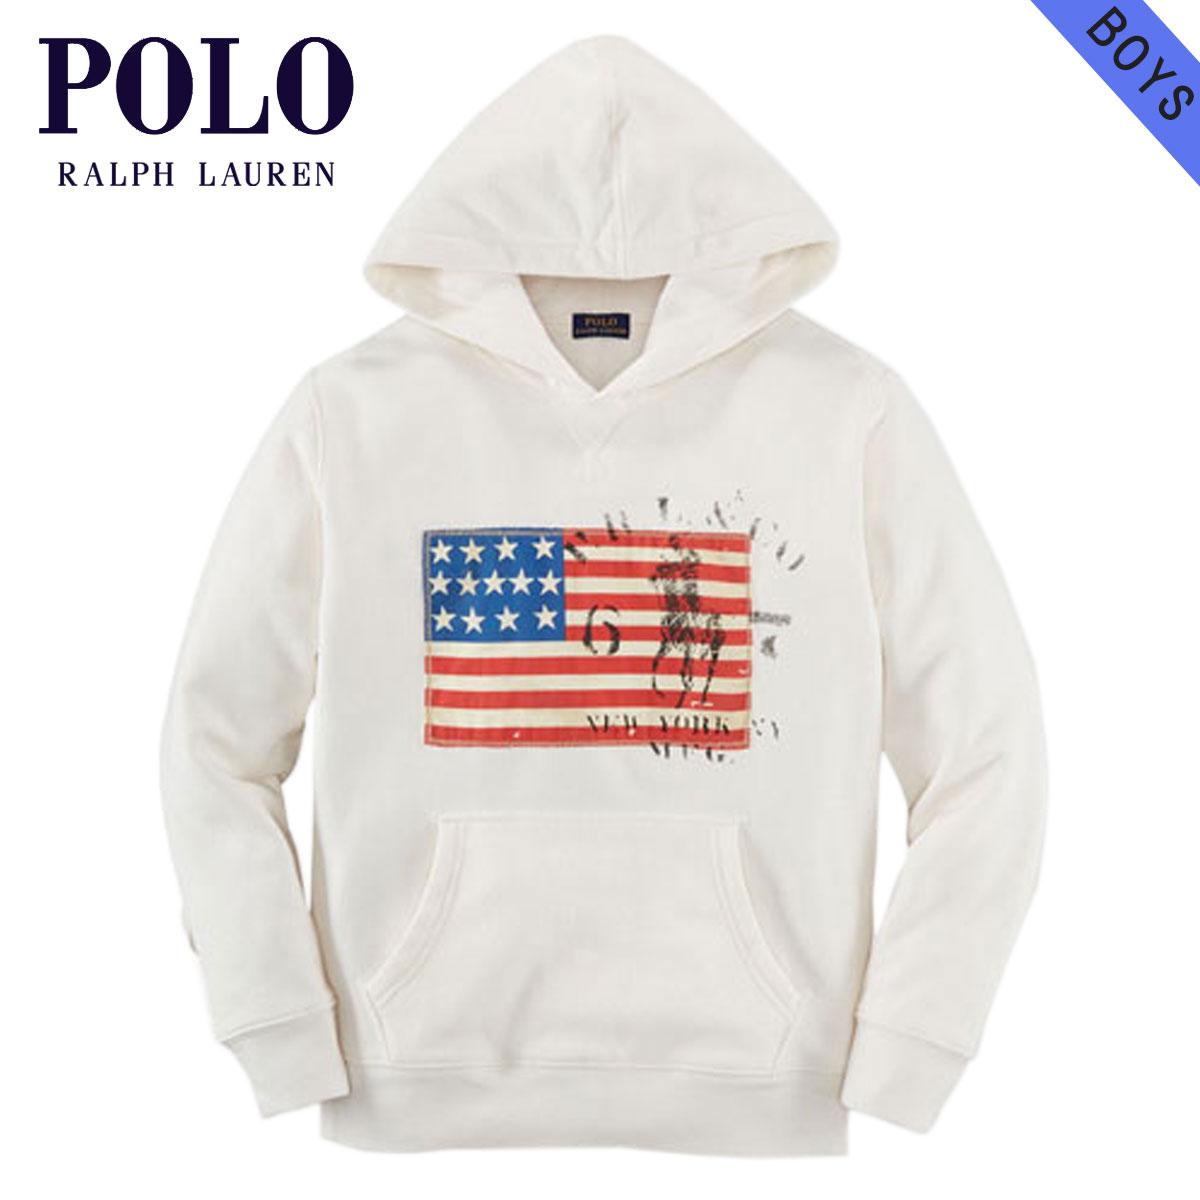 159c73a67 Poloralflorenkids POLO RALPH LAUREN CHILDREN genuine kids clothing boys  parka FLAG FLEECE HOODIE 37716966